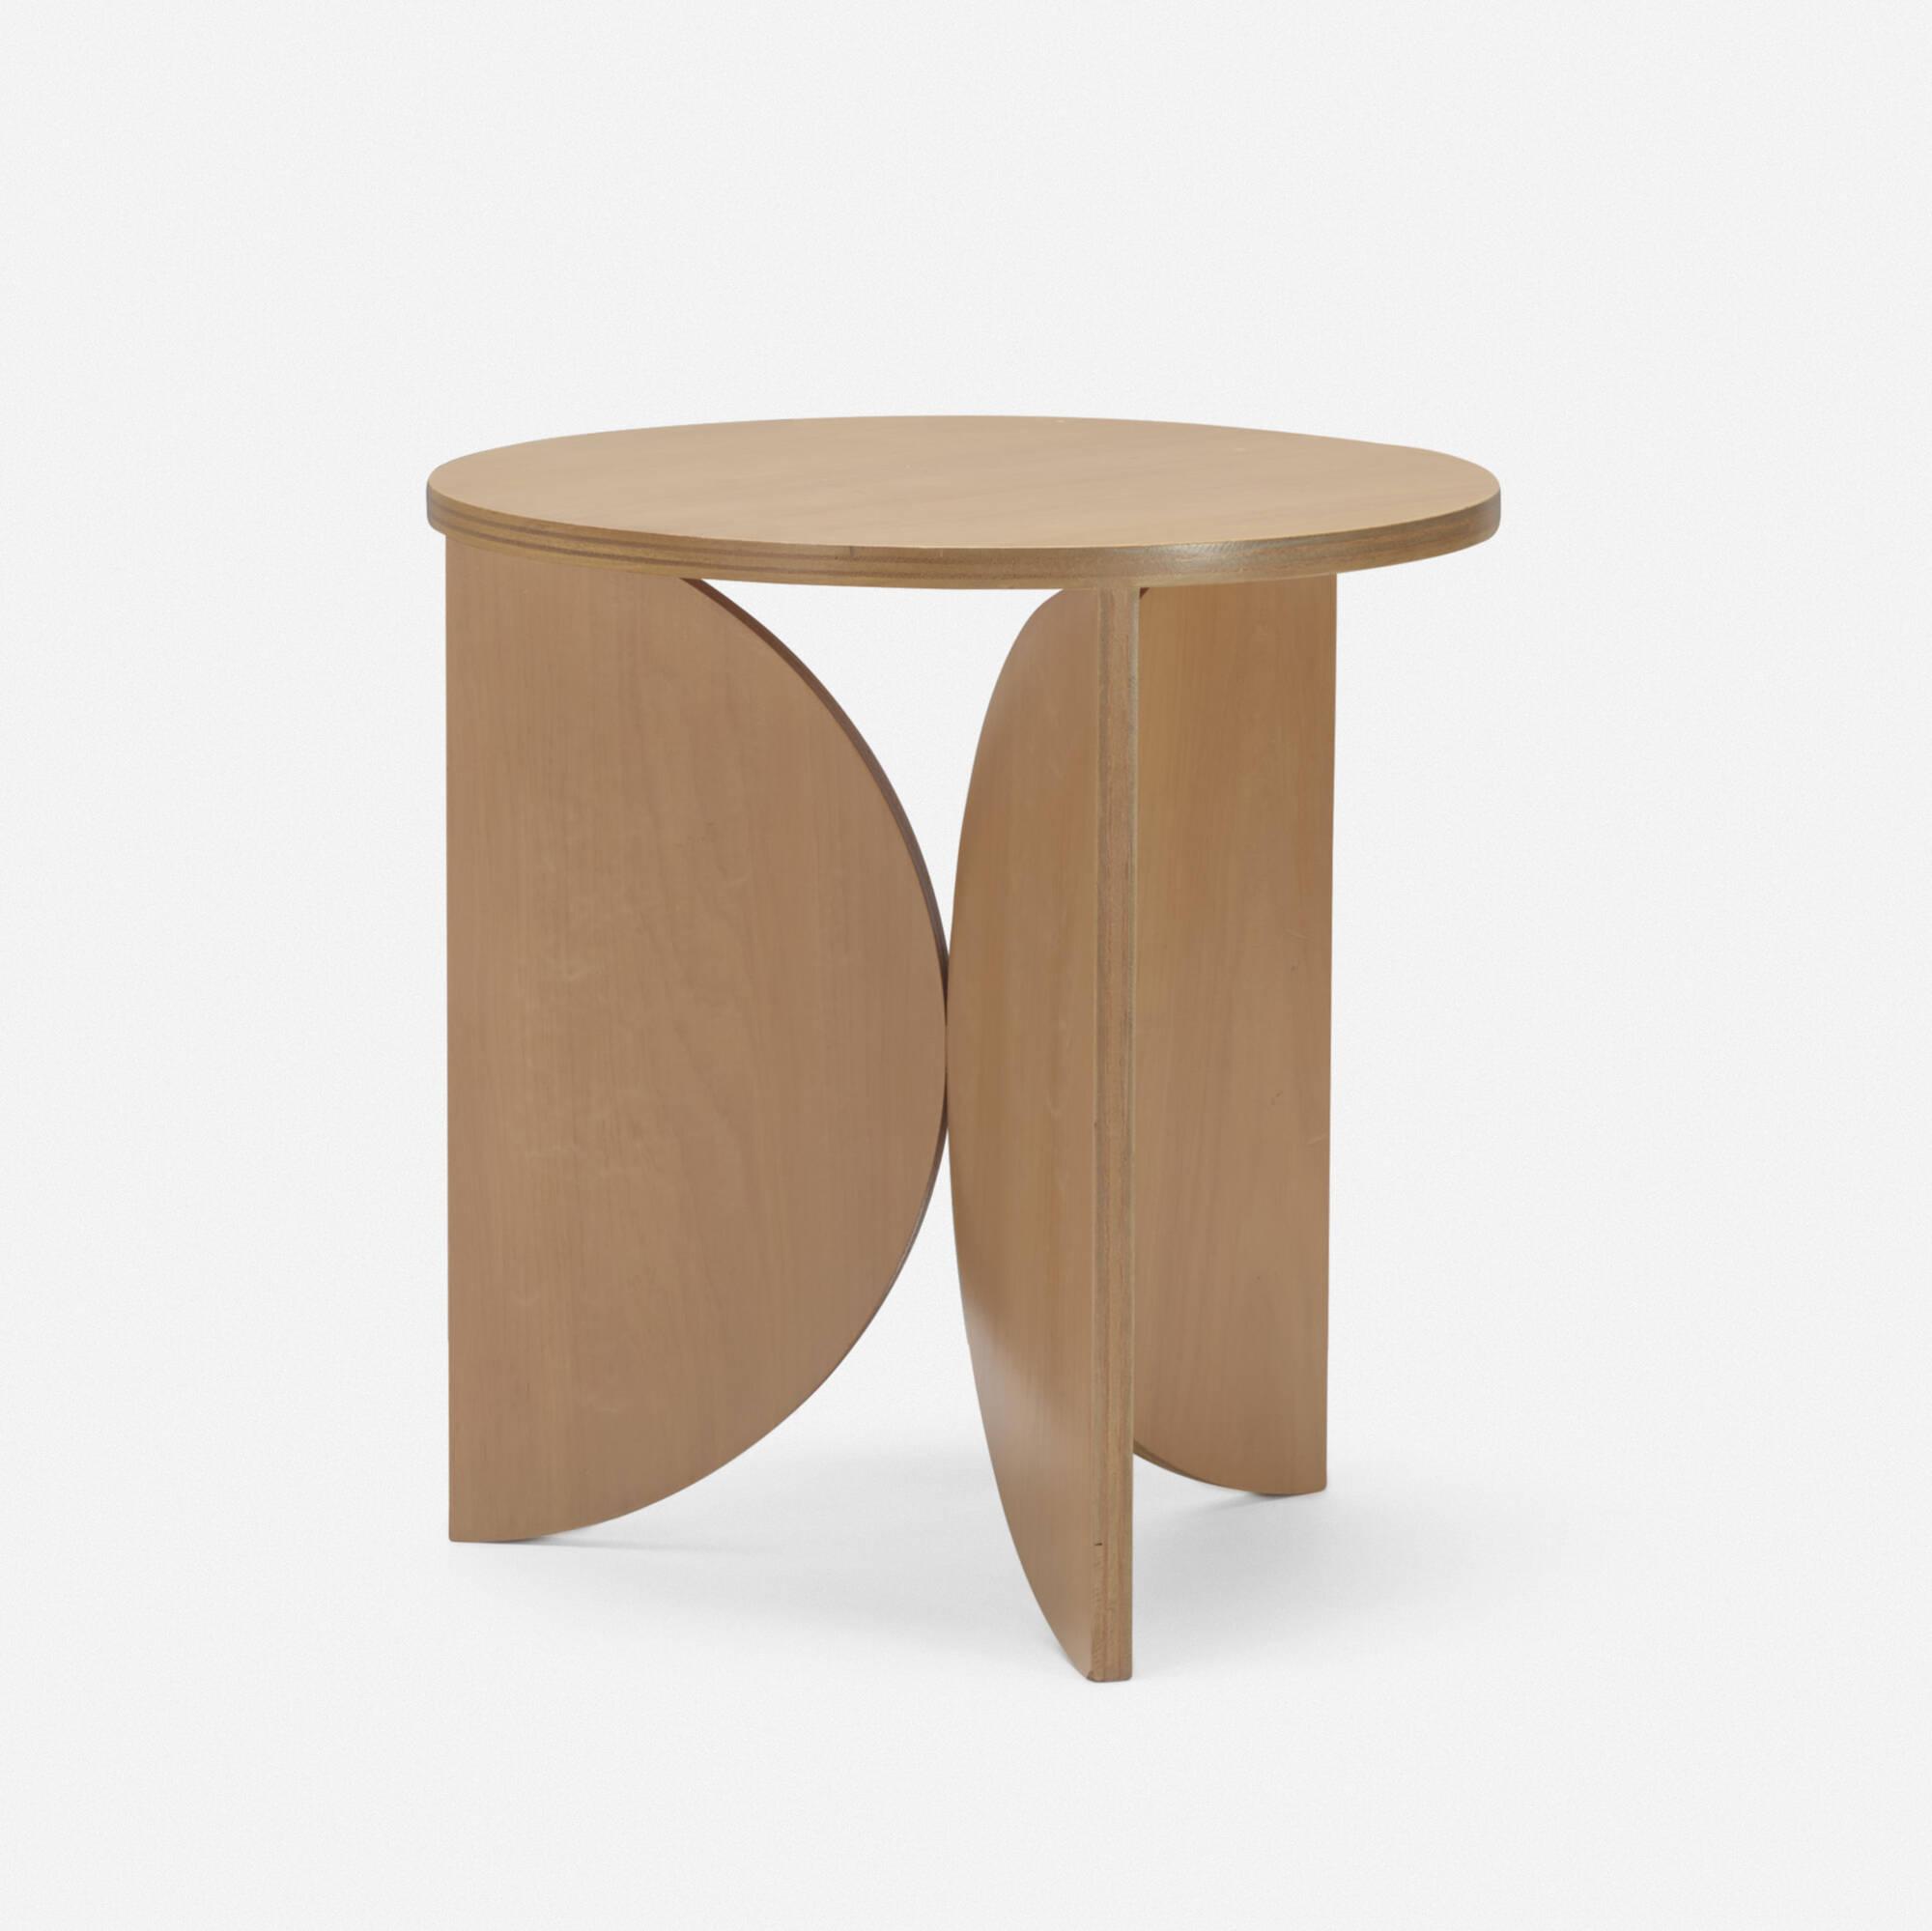 250: Scott Burton / Tripod table (2 of 3)